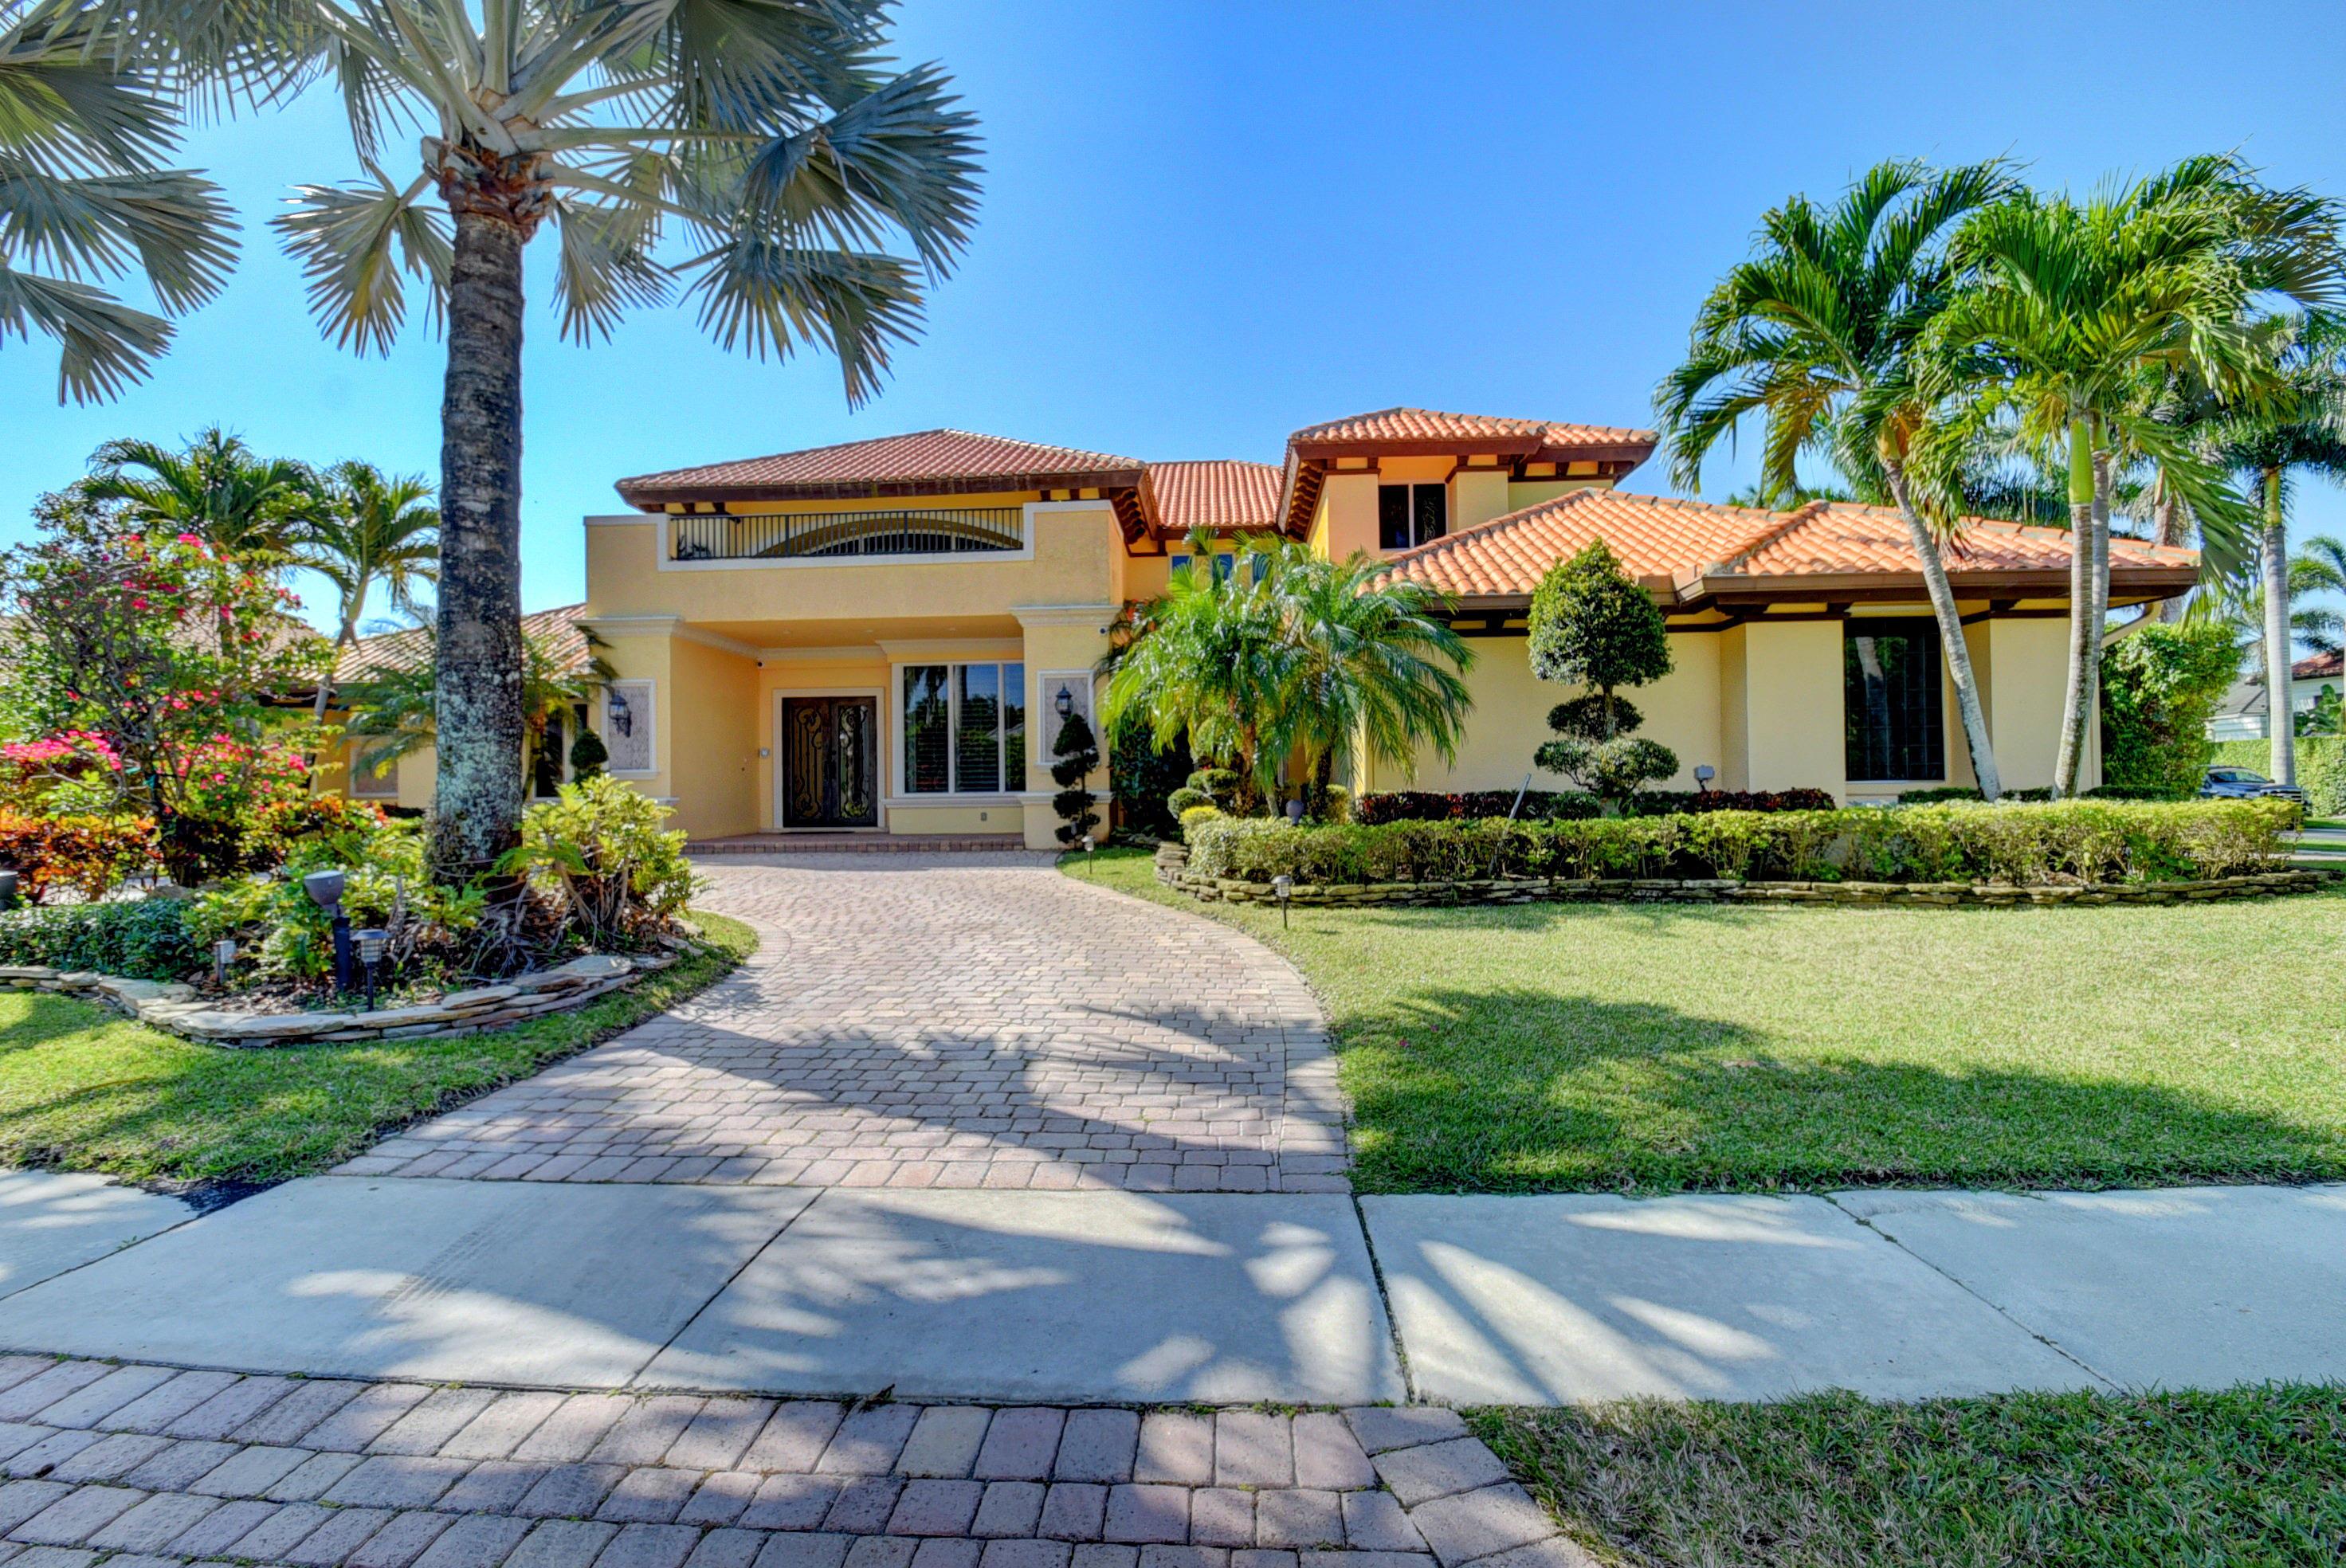 Photo of 3872 NW 53rd Street, Boca Raton, FL 33496